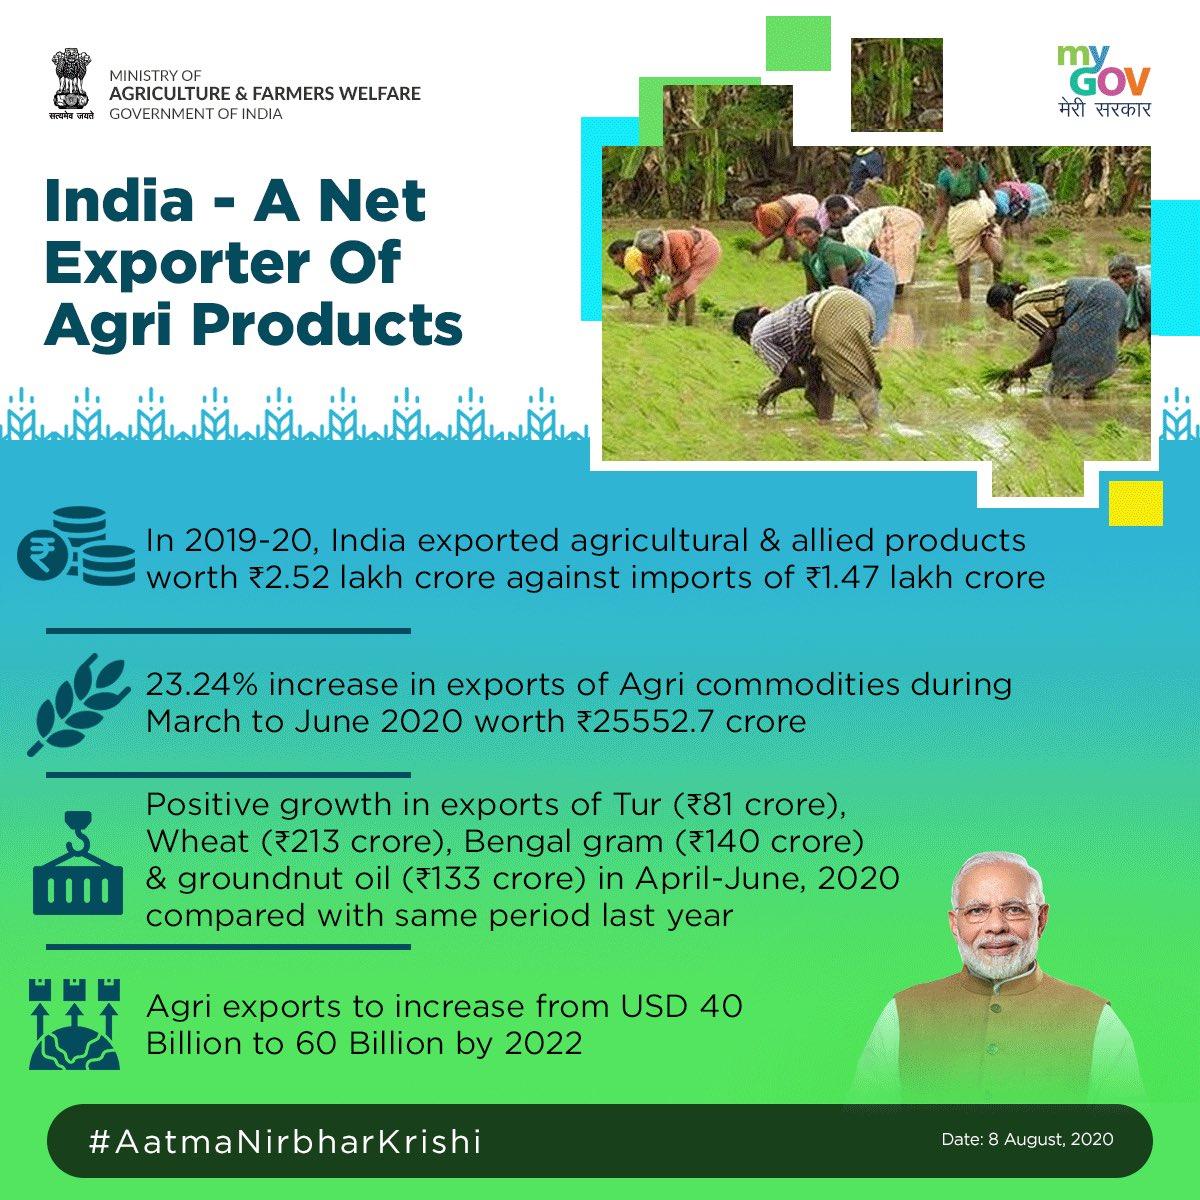 India - A net exporter of Agri-Products.   #AatmaNirbharKrishi https://t.co/nDsU9VQhxs